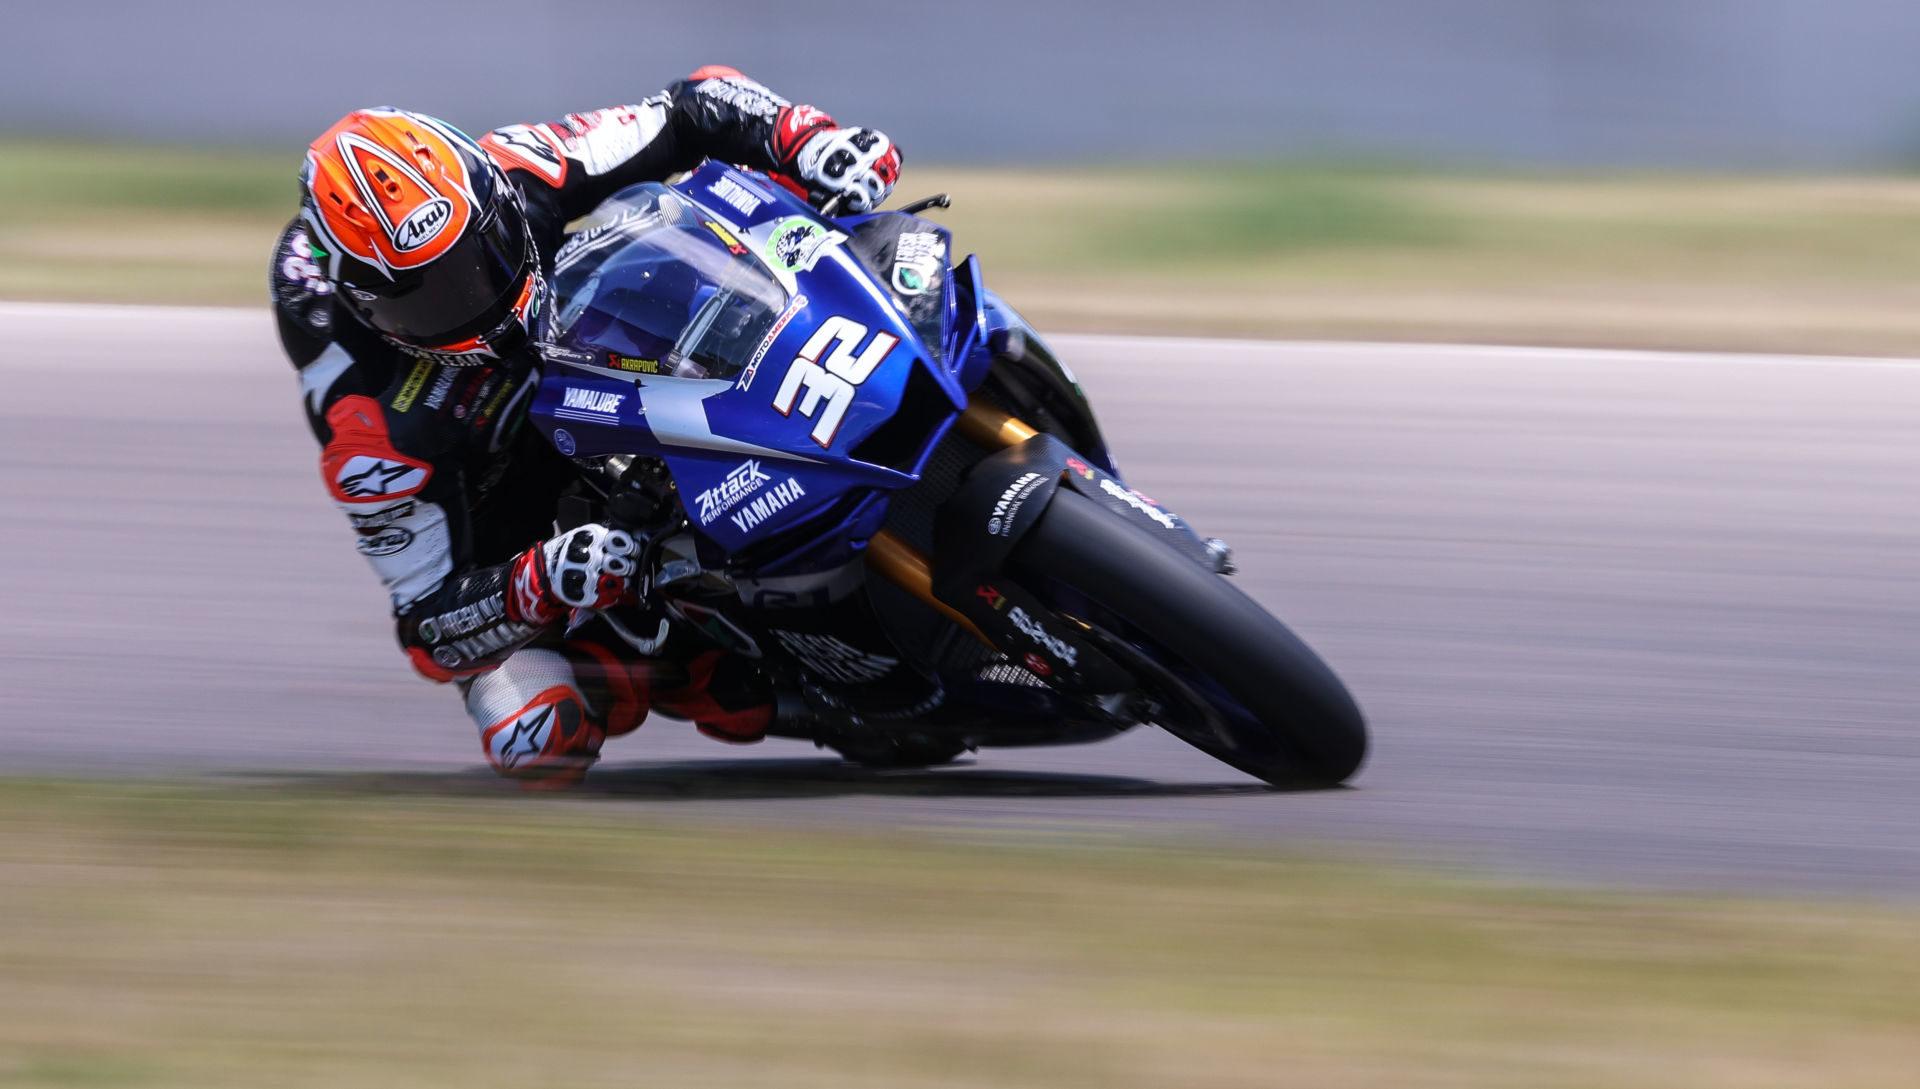 Jake Gagne (32) during testing at Brainerd International Raceway. Photo by Brian J. Nelson.